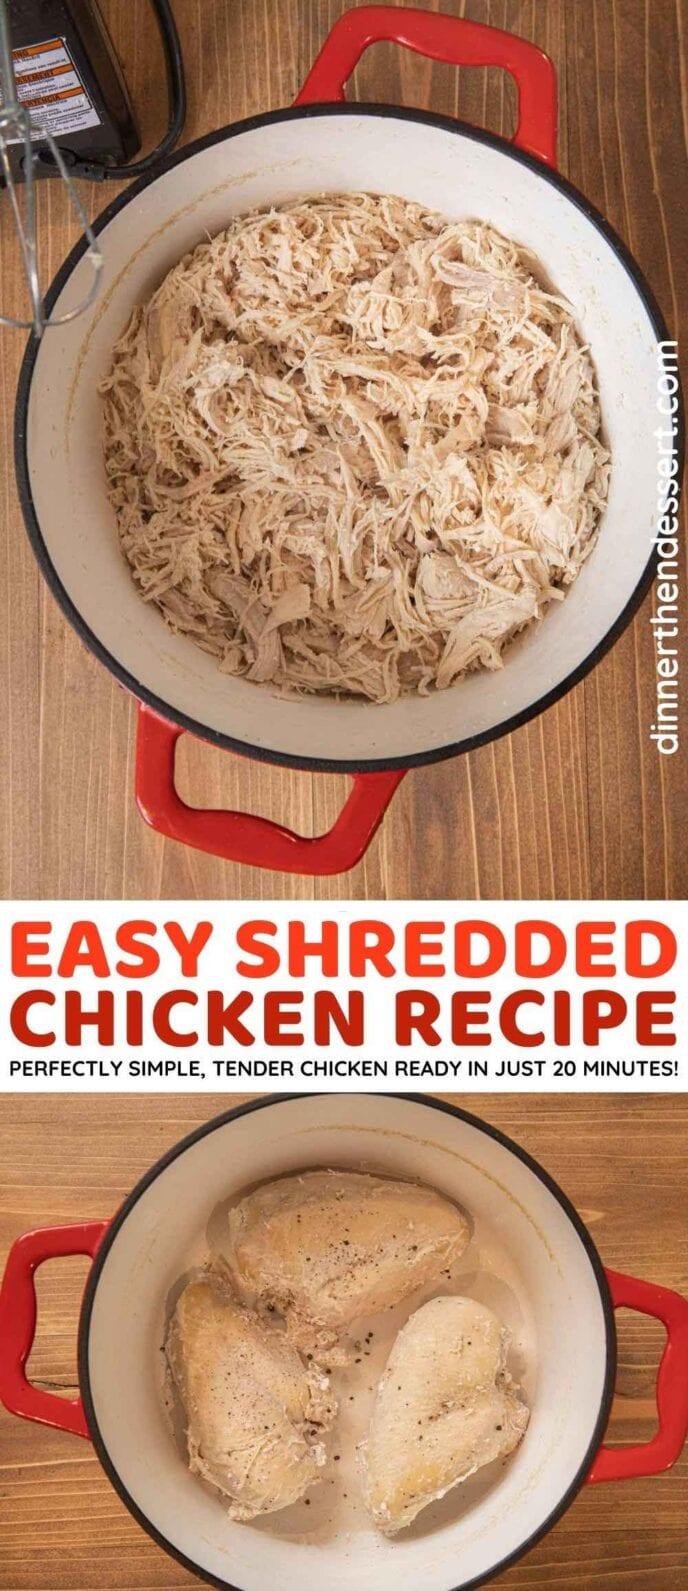 Easy Shredded Chicken collage